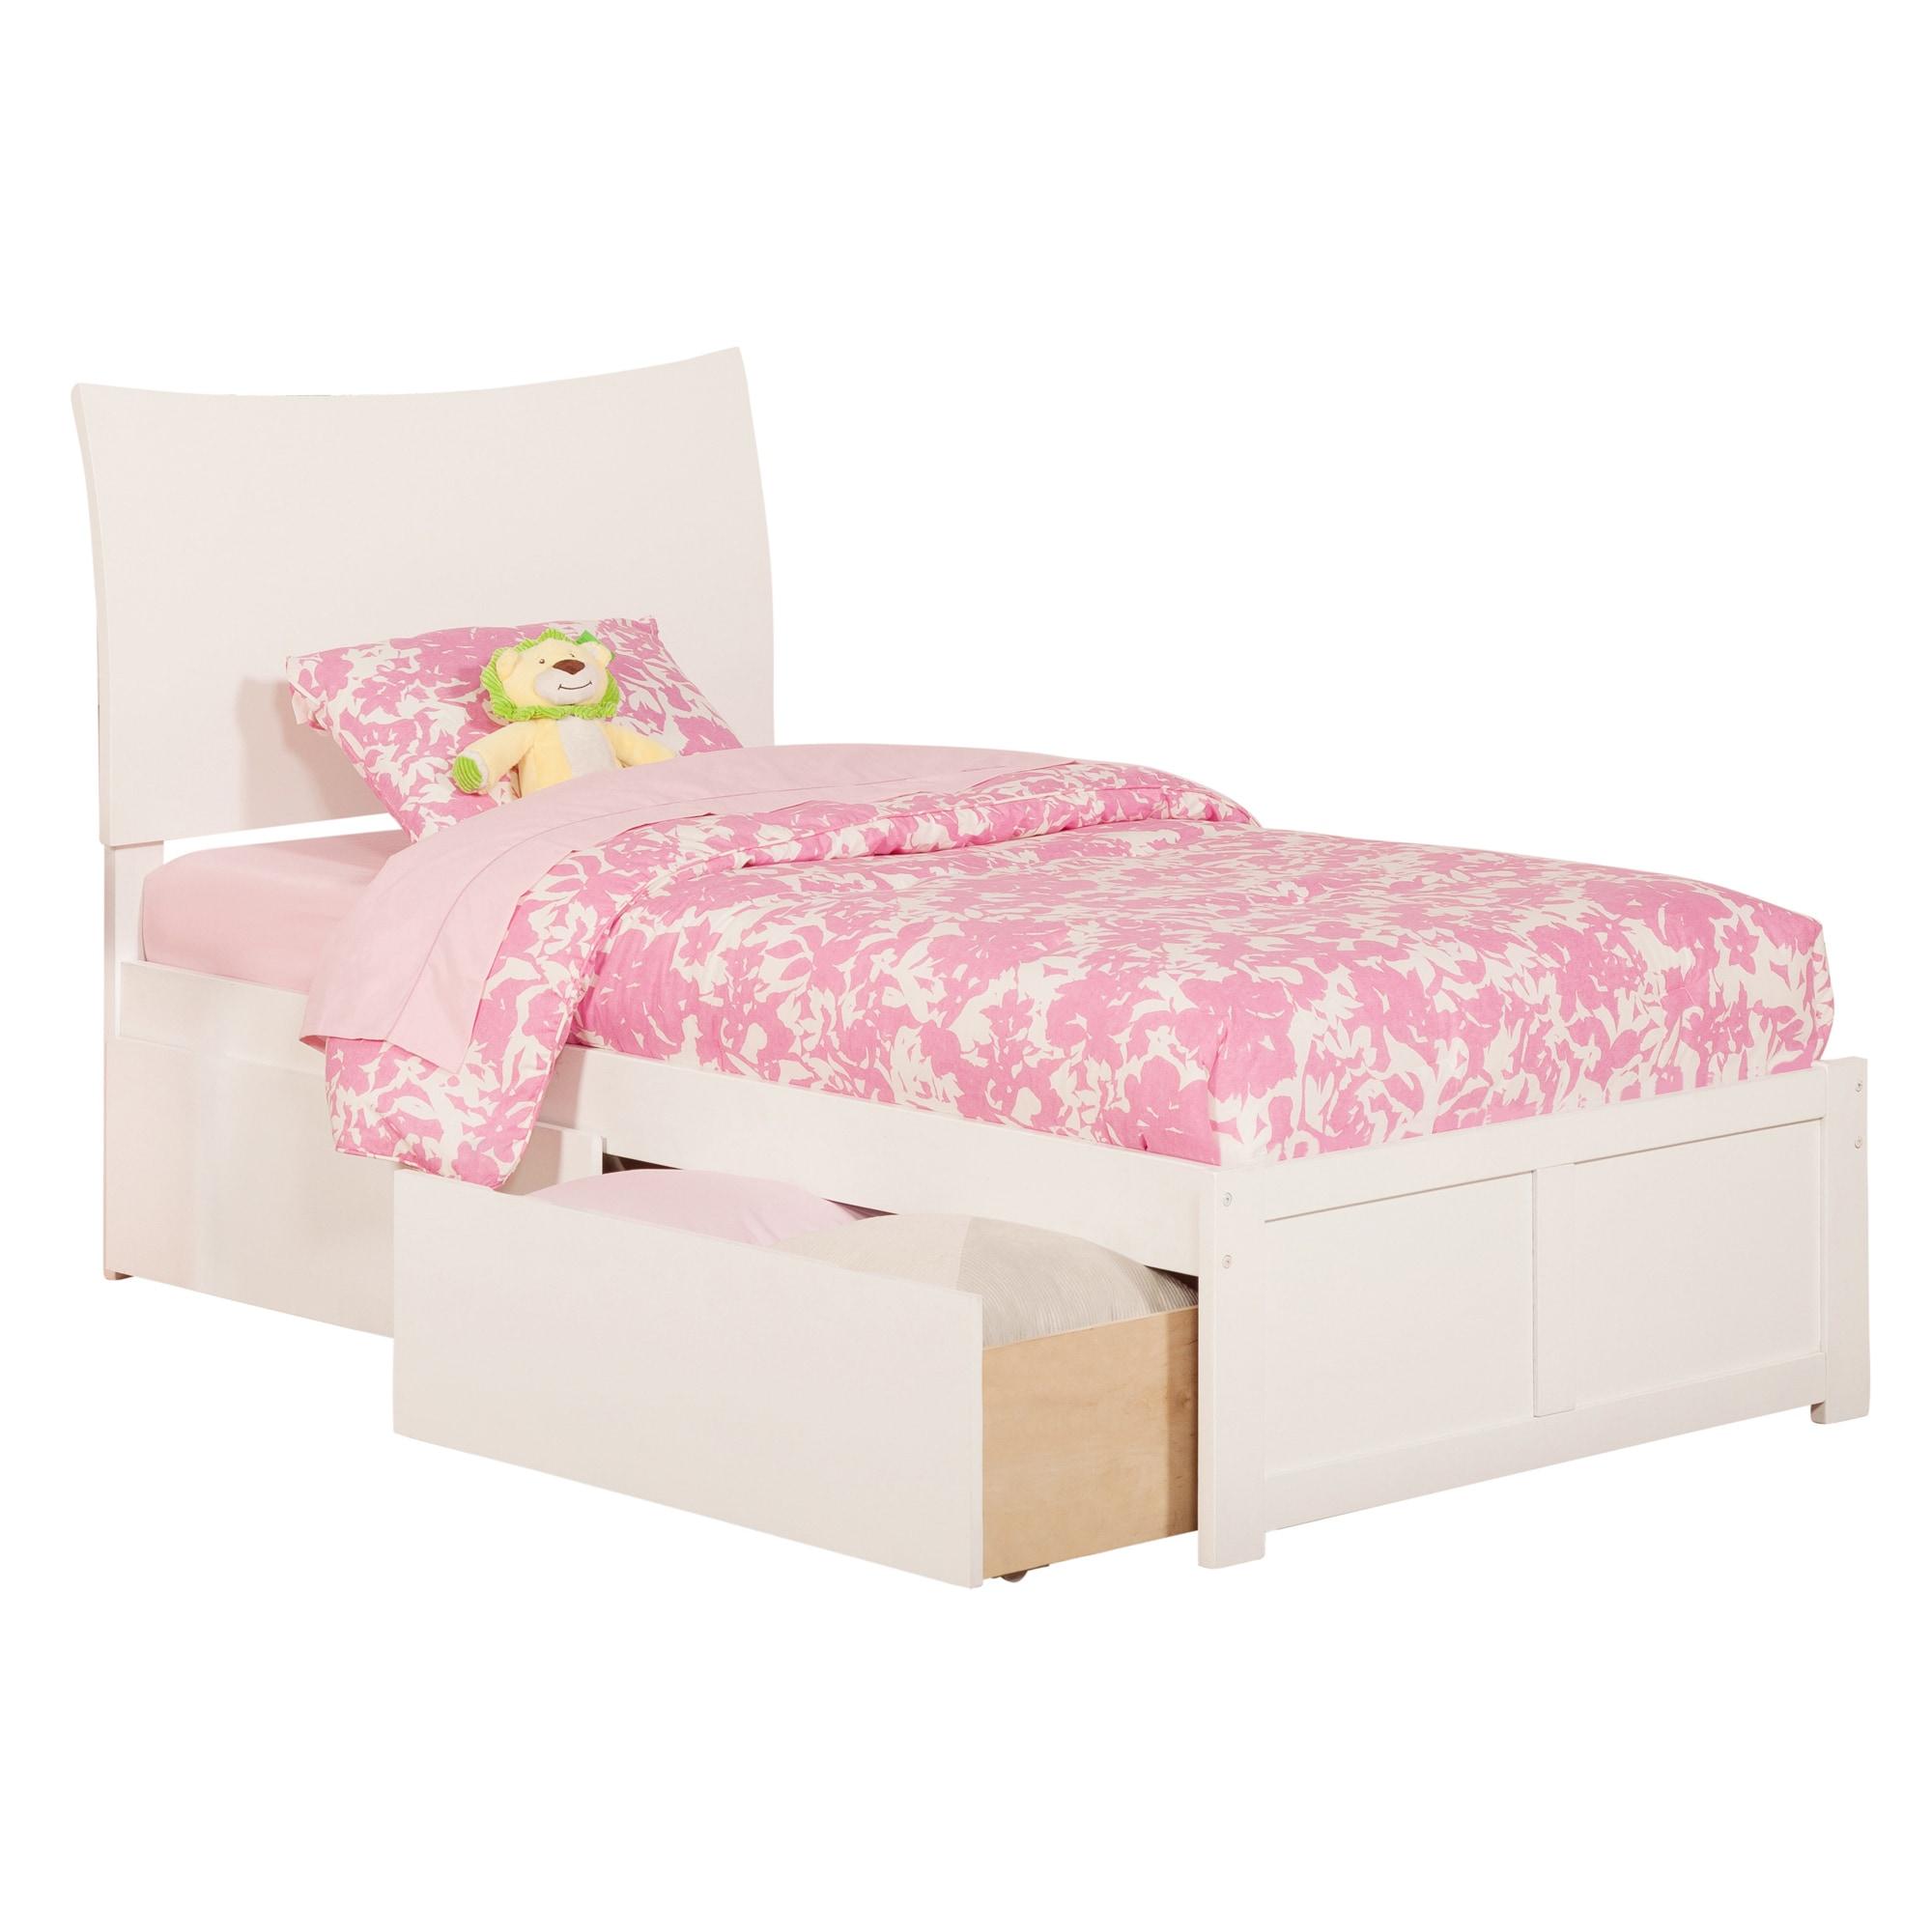 Atlantic Furniture Soho White Twin XL Flat Panel Footboar...